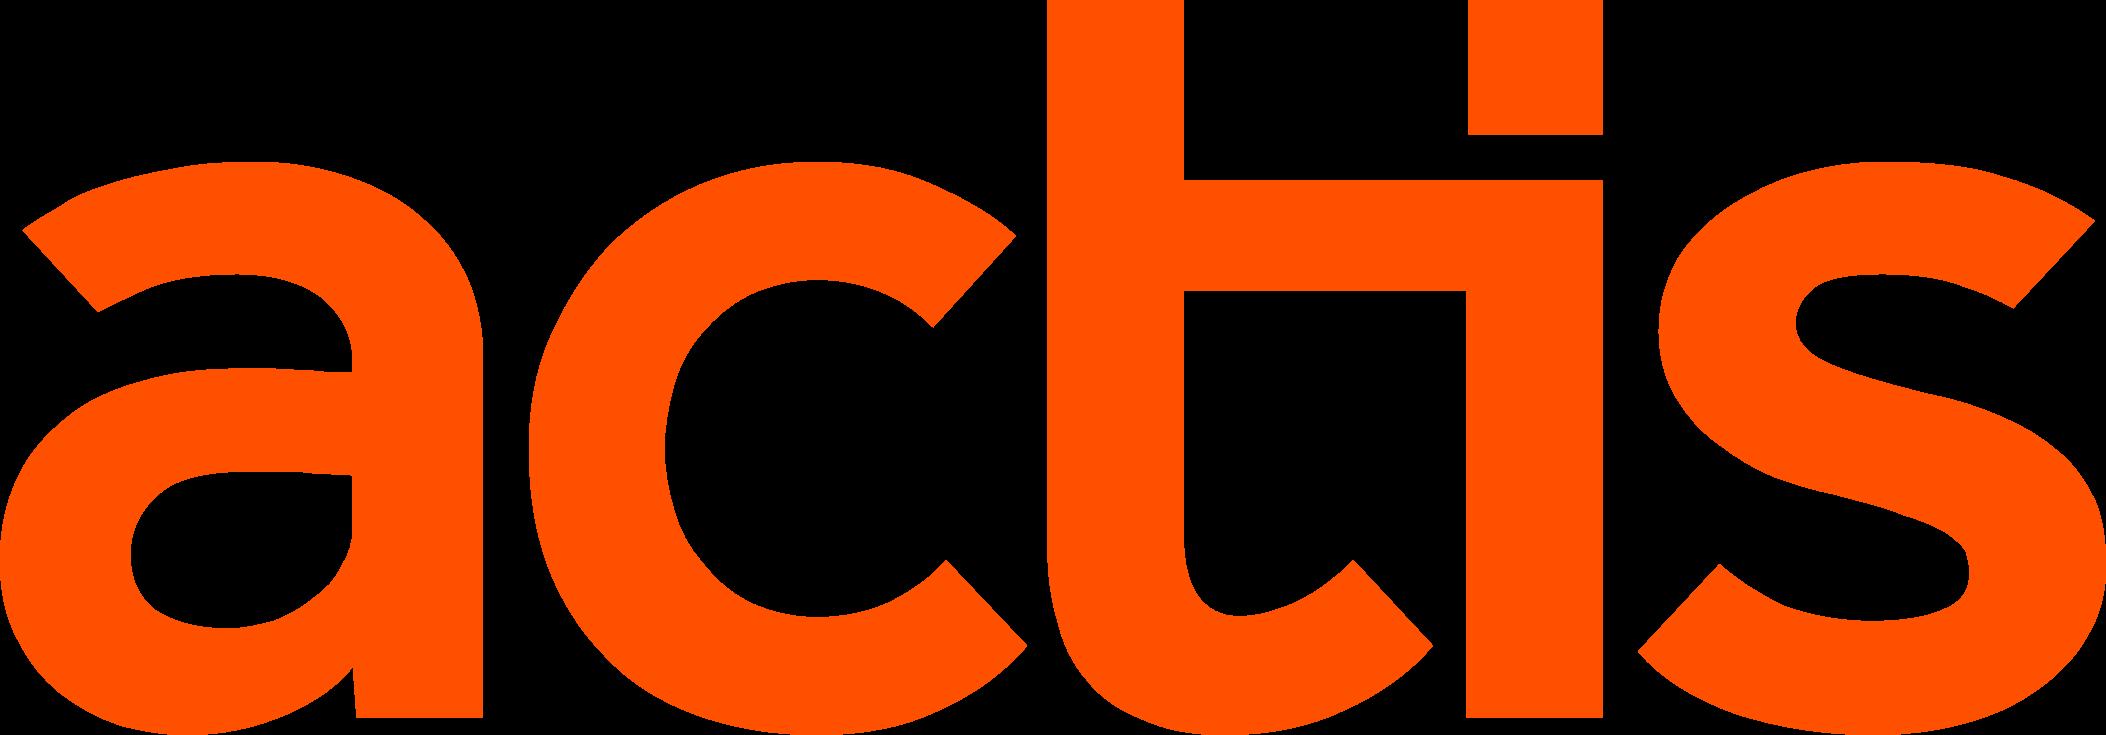 Actis Capital - Wikipedia